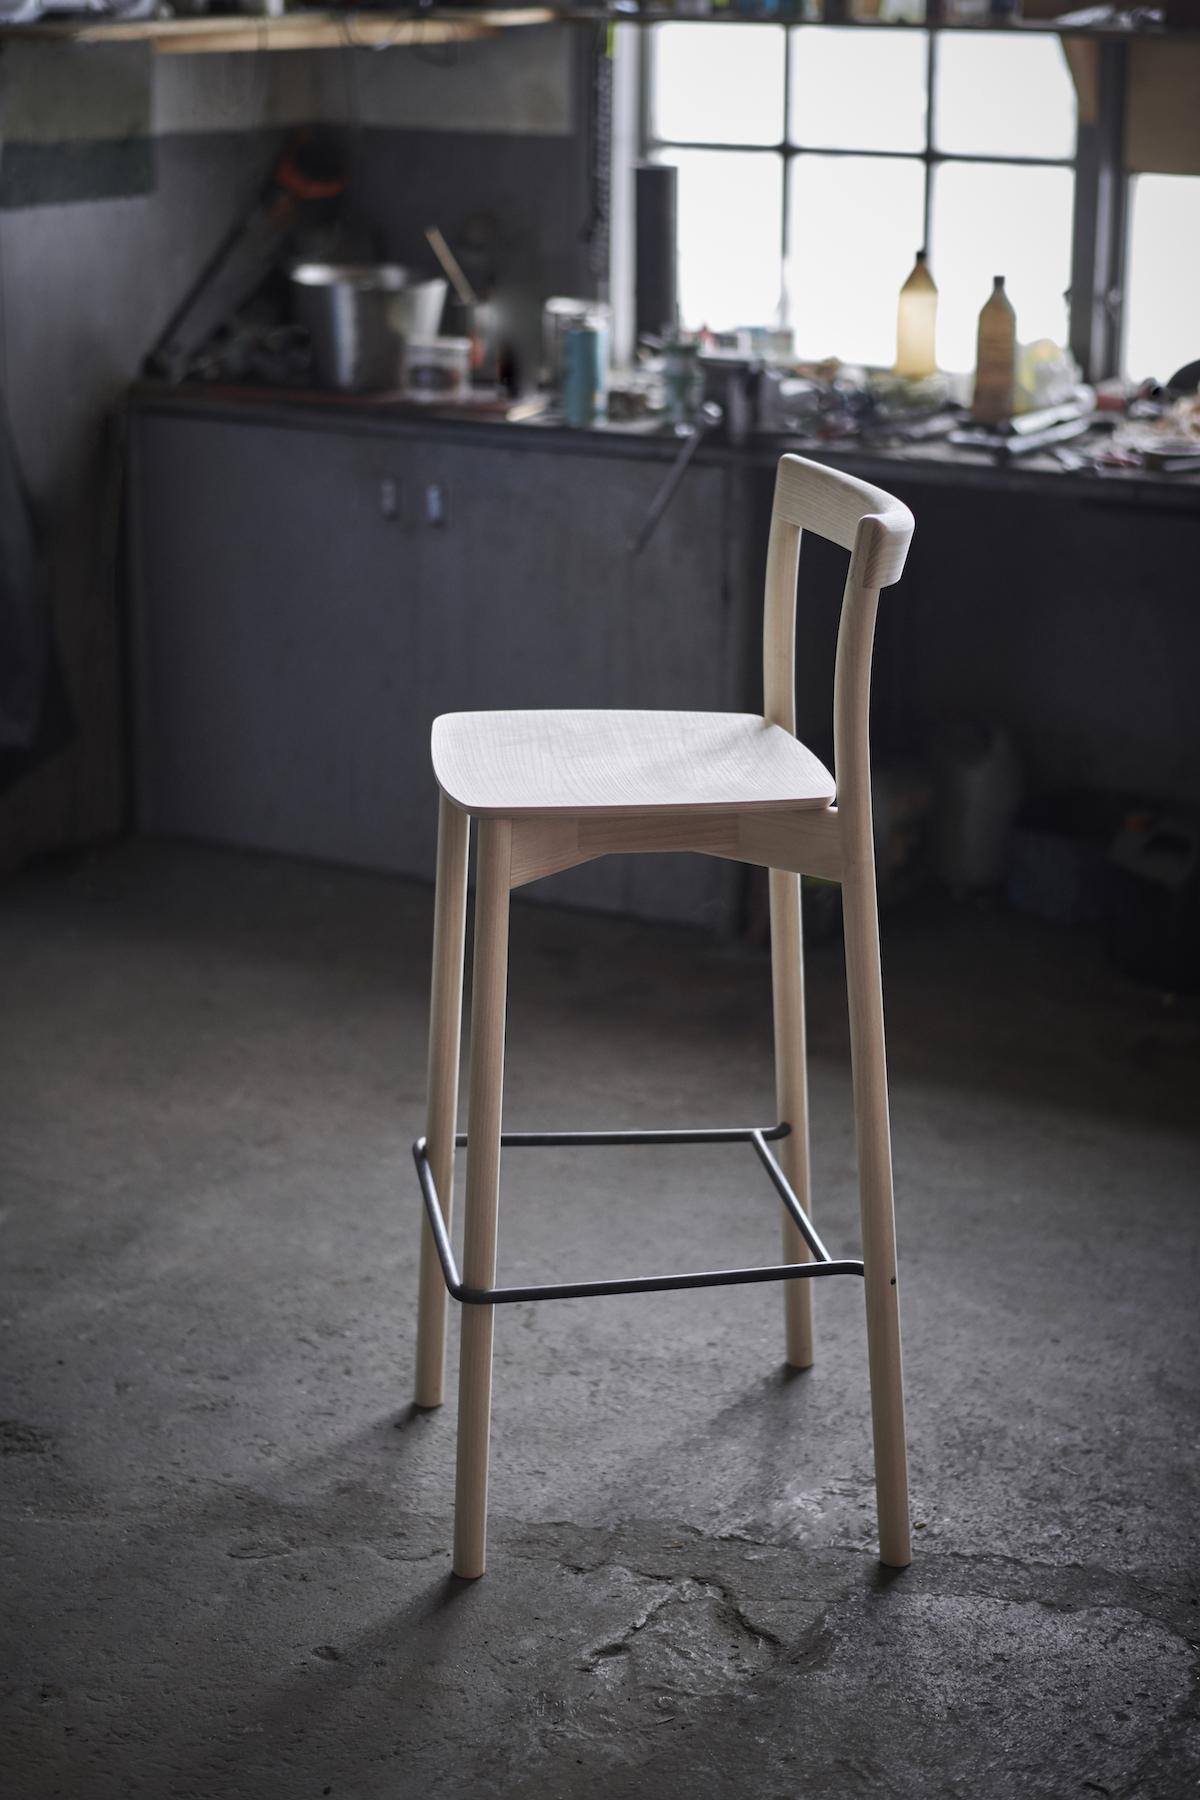 Barstol, NORDIC, Träsits, H 66 cm, Sami Kallio & Jakob Thau